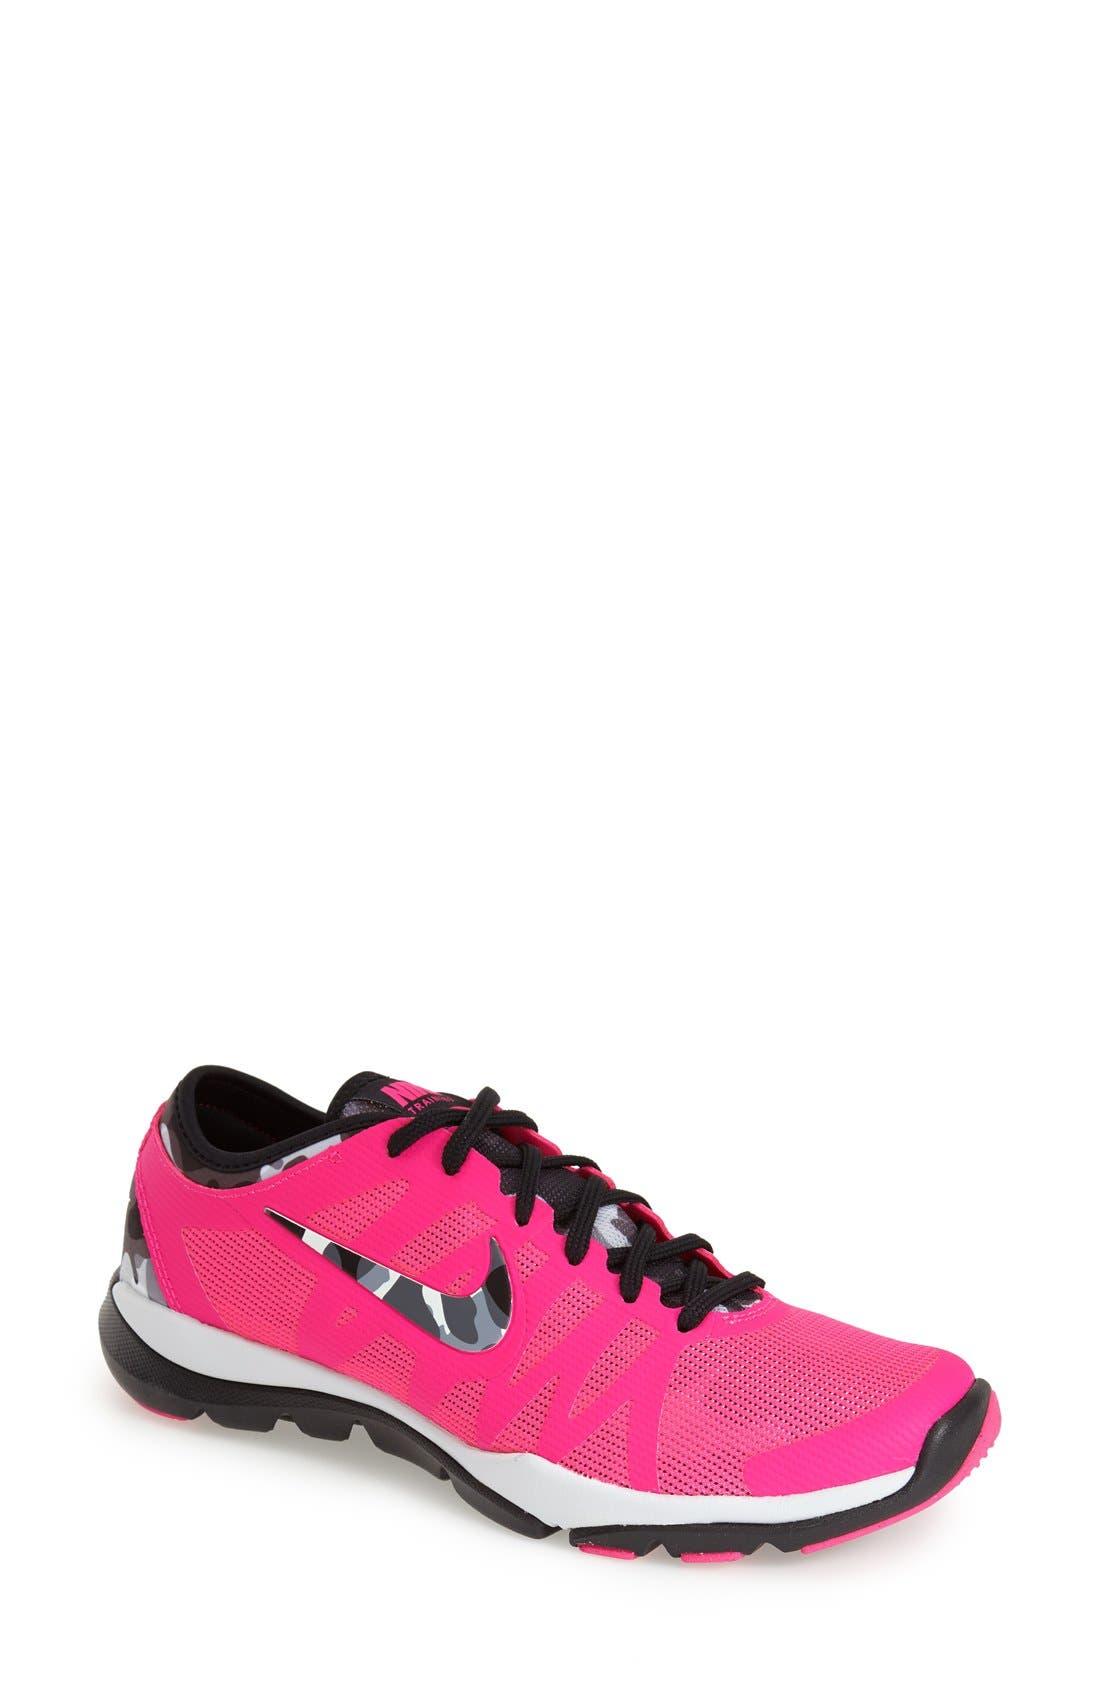 Main Image - Nike 'Flex Supreme TR 3' Training Shoe (Women)